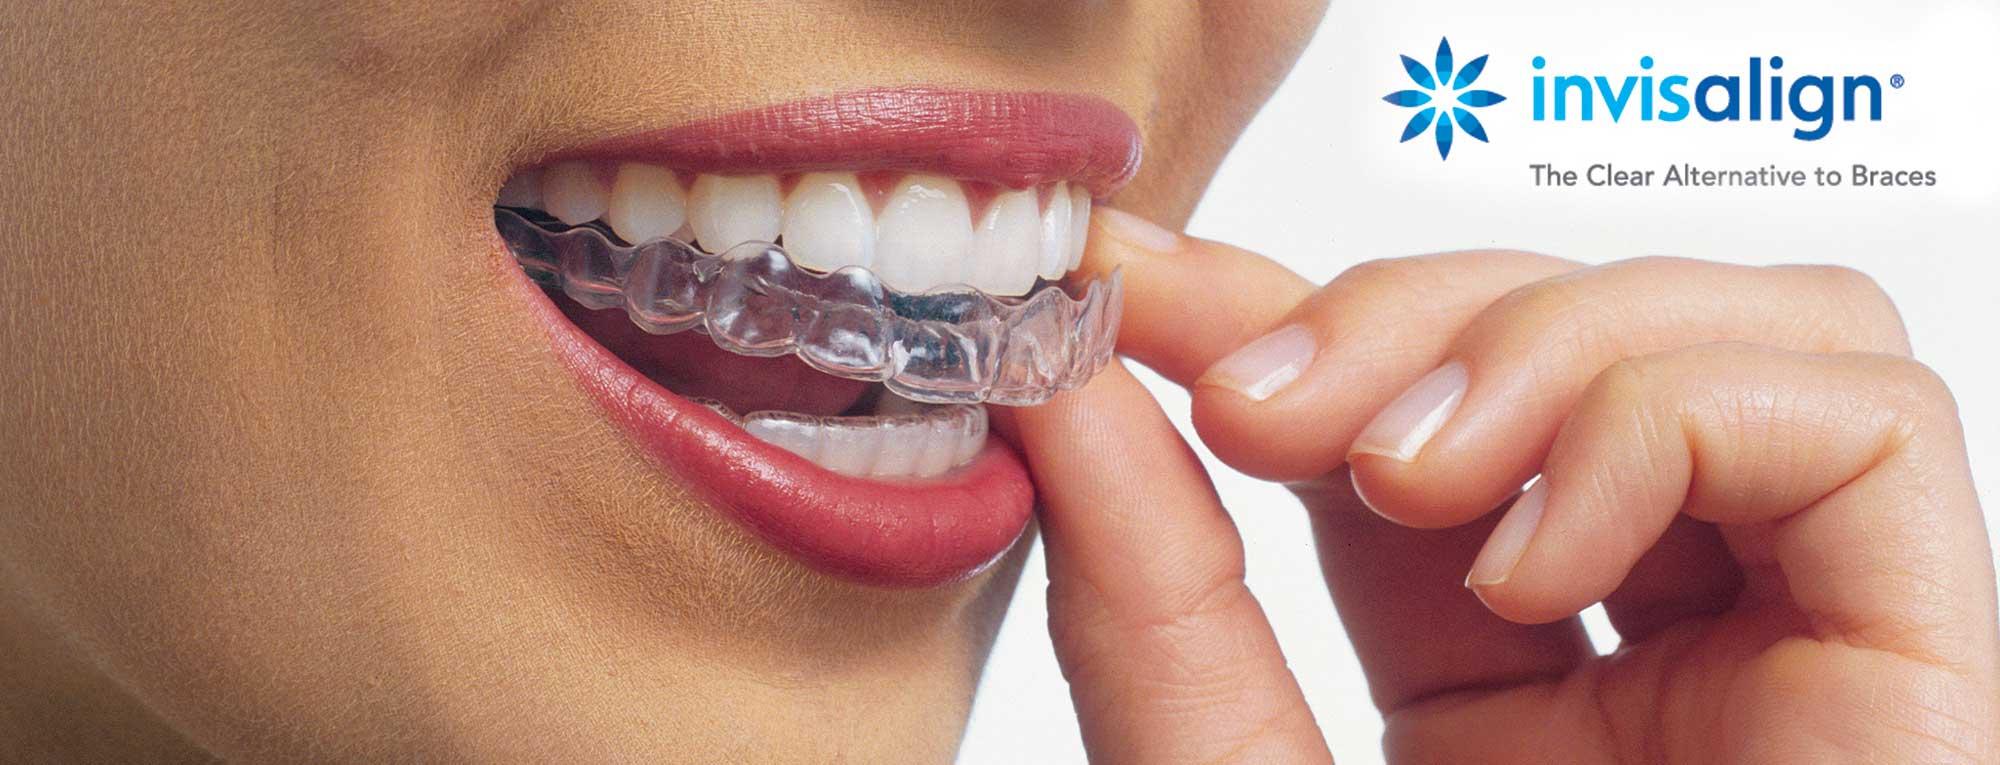 Invisalign Modern Smiles Dentistry North Hollywood